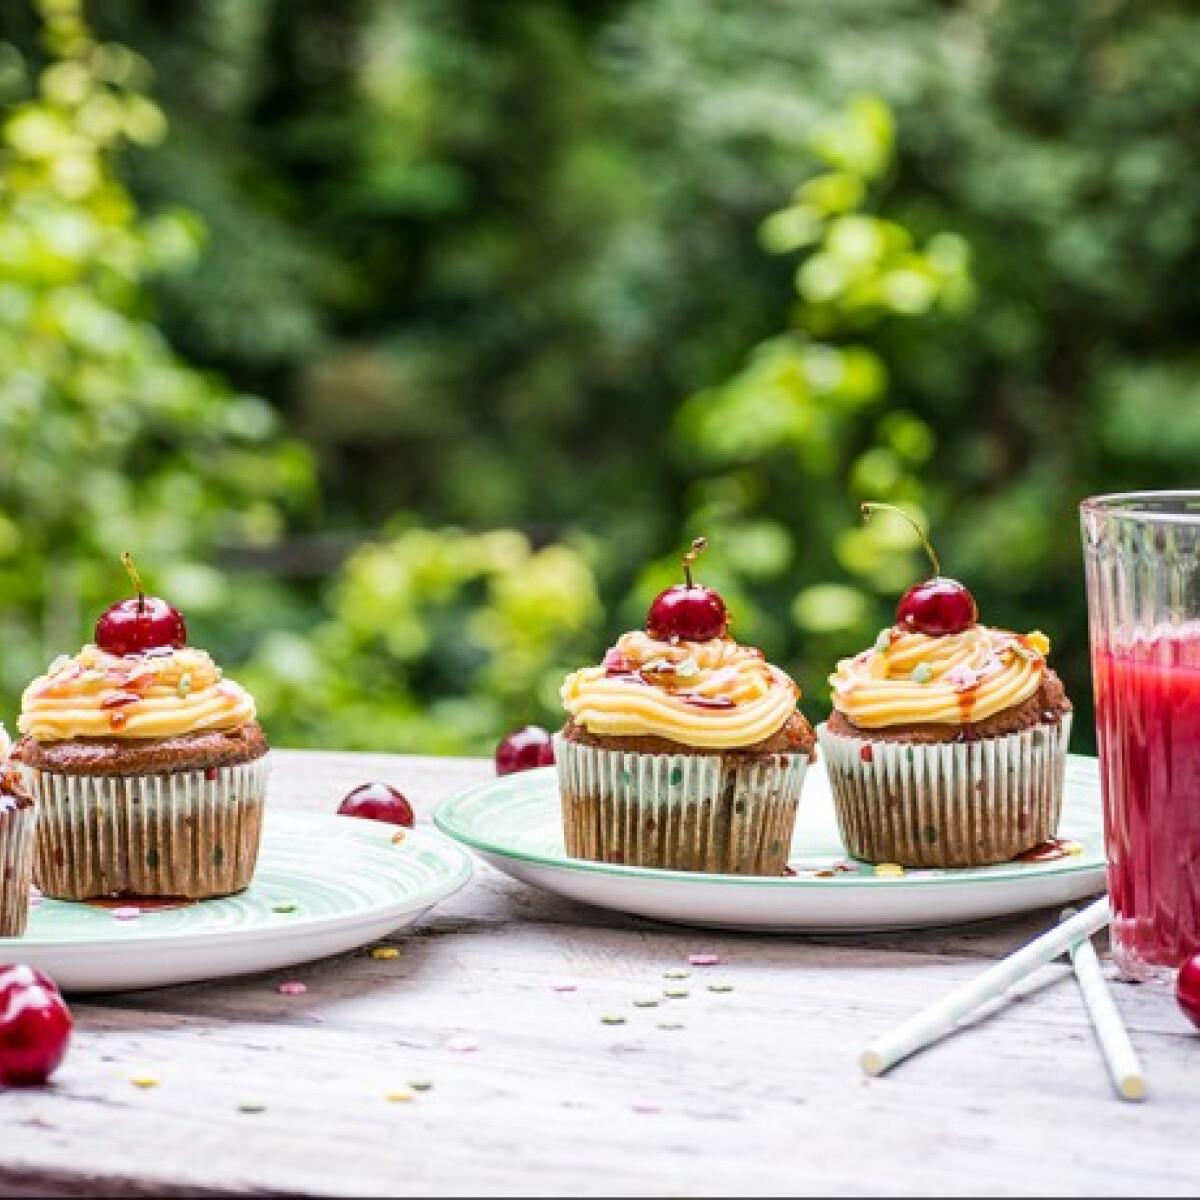 Meggyhabos muffin